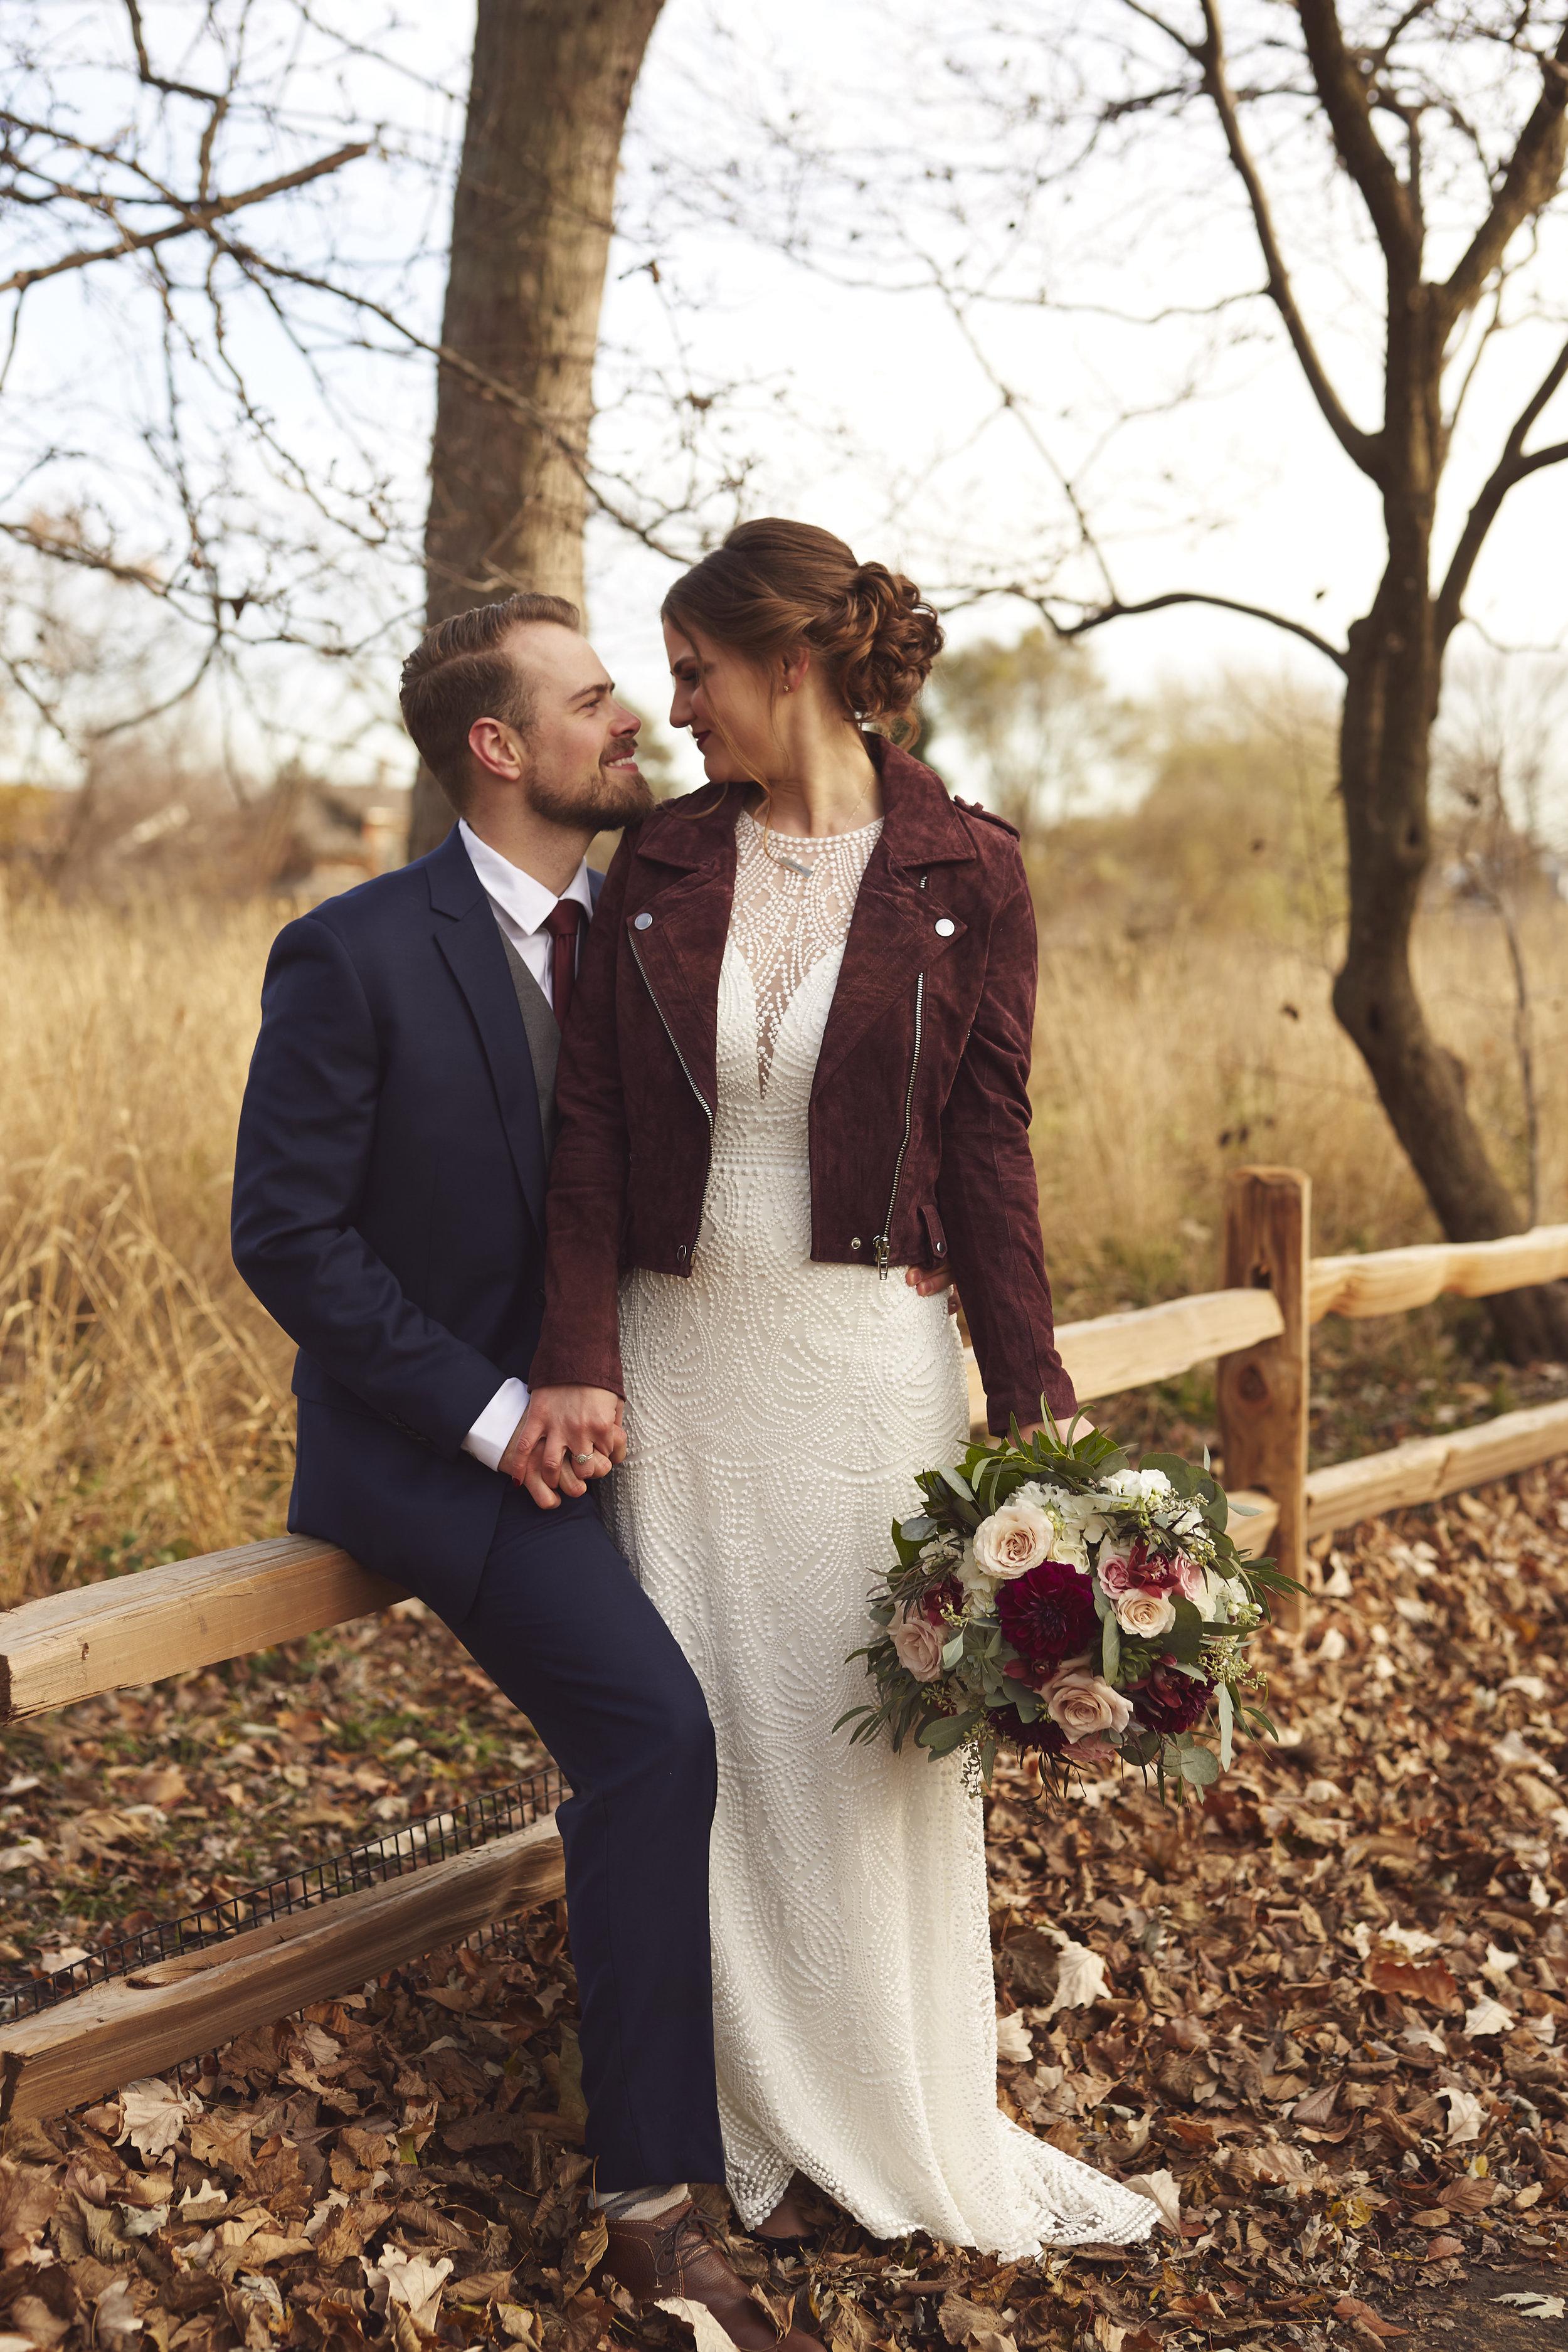 Jen & Ben Wedding - benromangphoto - 6I5A9924.jpg